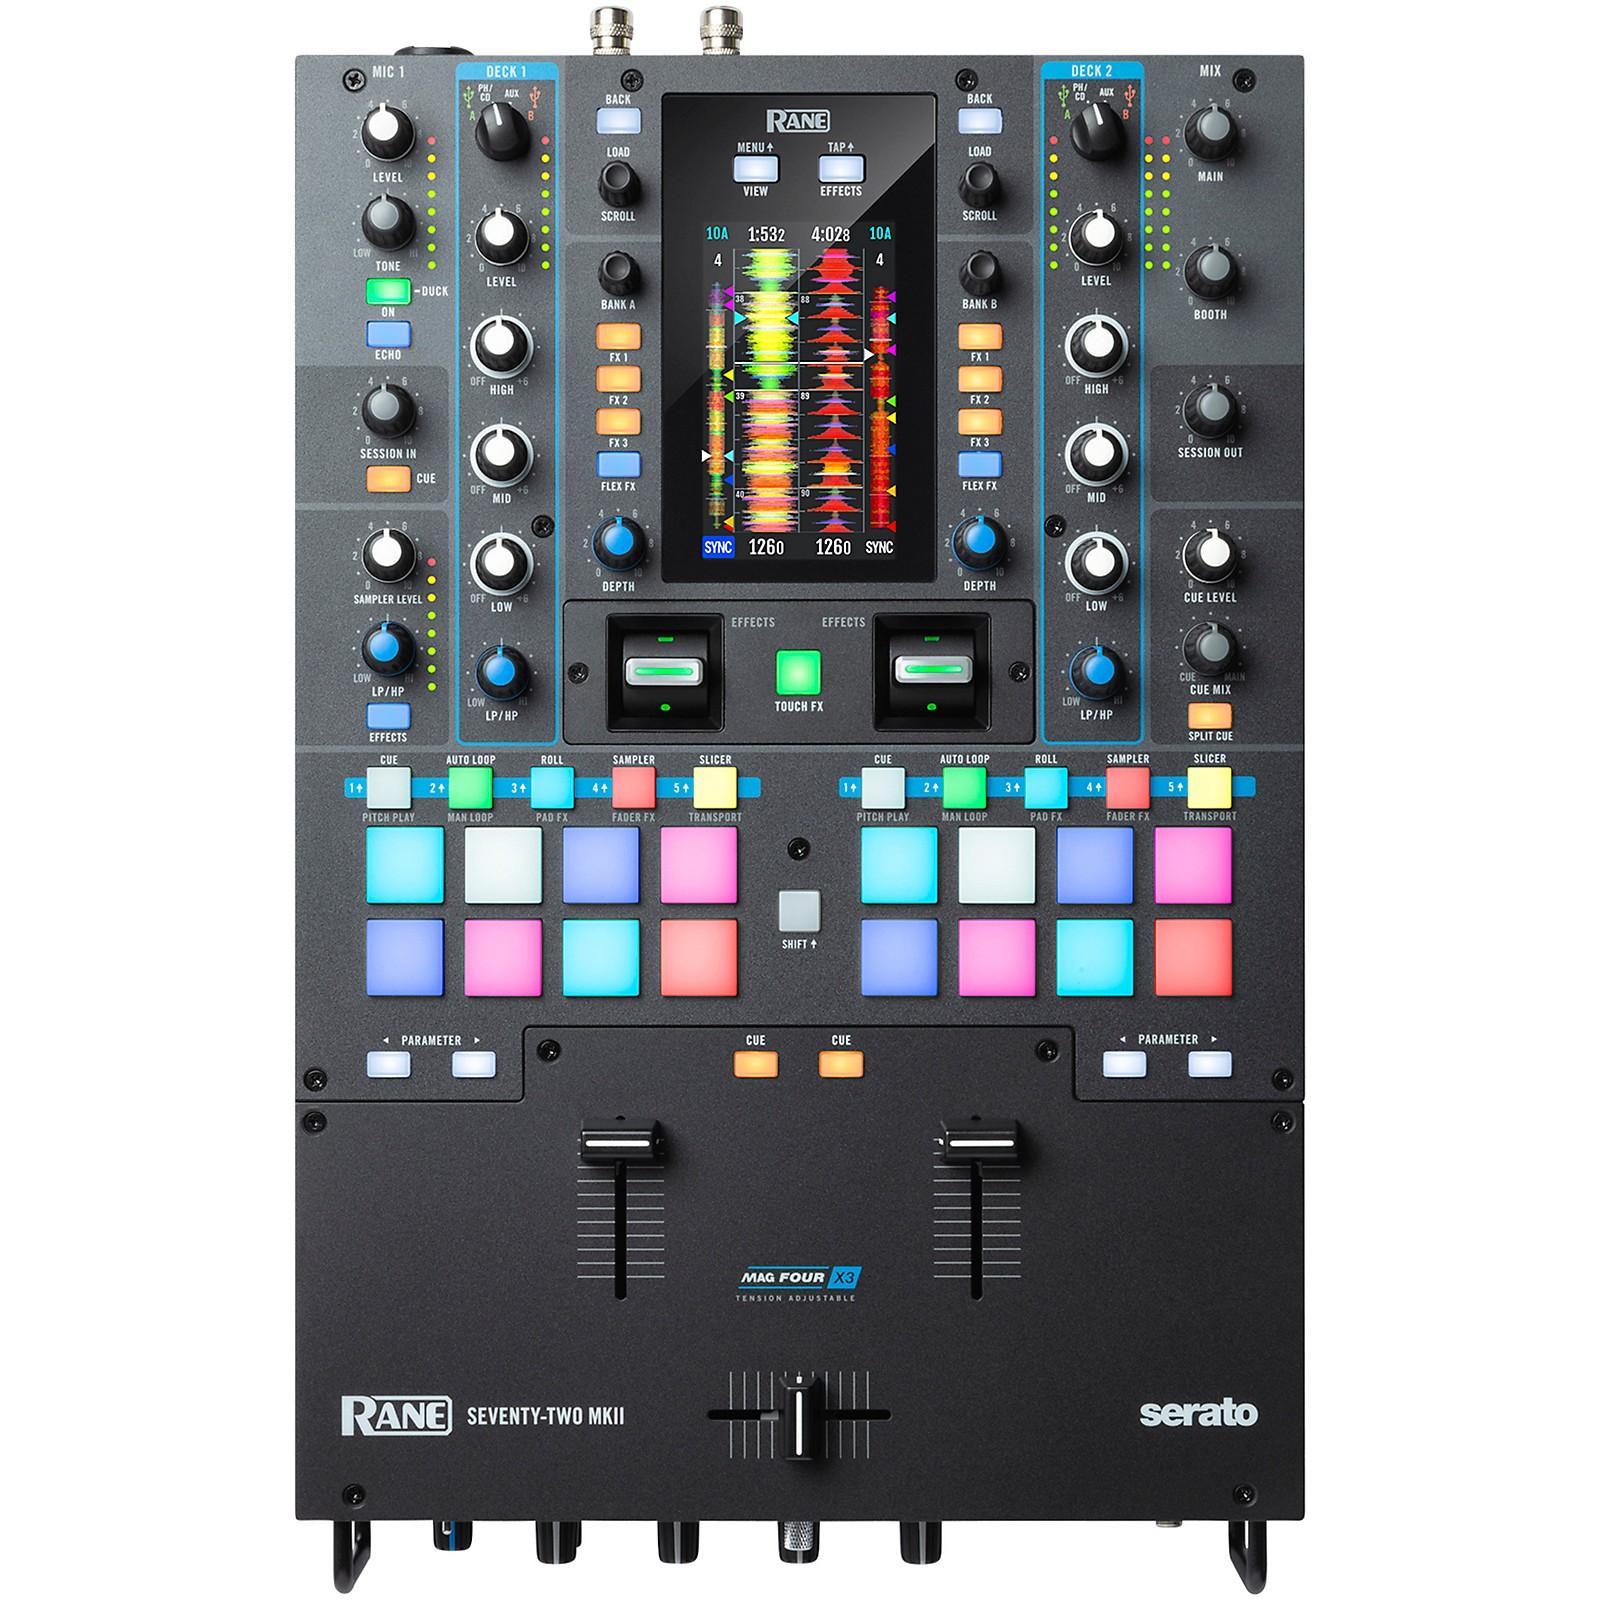 RANE DJ SEVENTY-TWO MKII Battle-Ready 2-Channel DJ Mixer with Multi-Touch Screen and Serato DJ